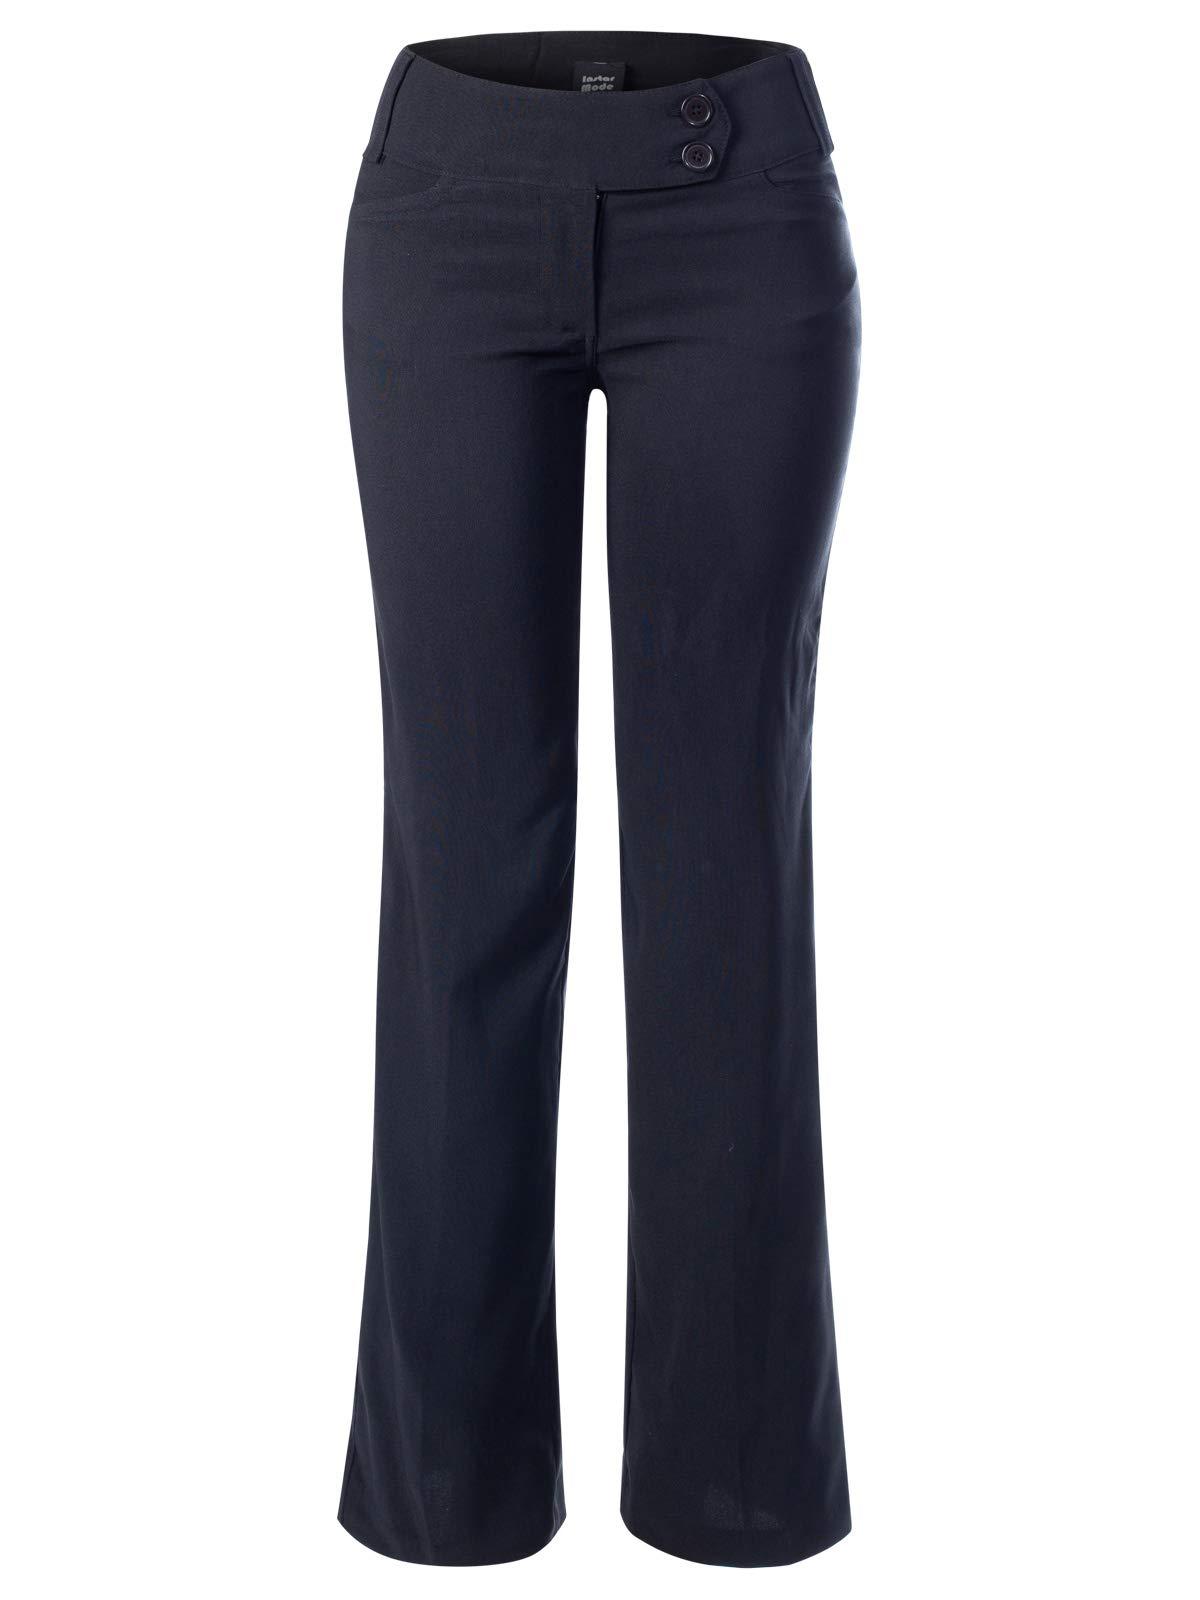 Instar Mode Women's High Waist Slim Boot-Cut Stretch Dress Pants Trousers Black M